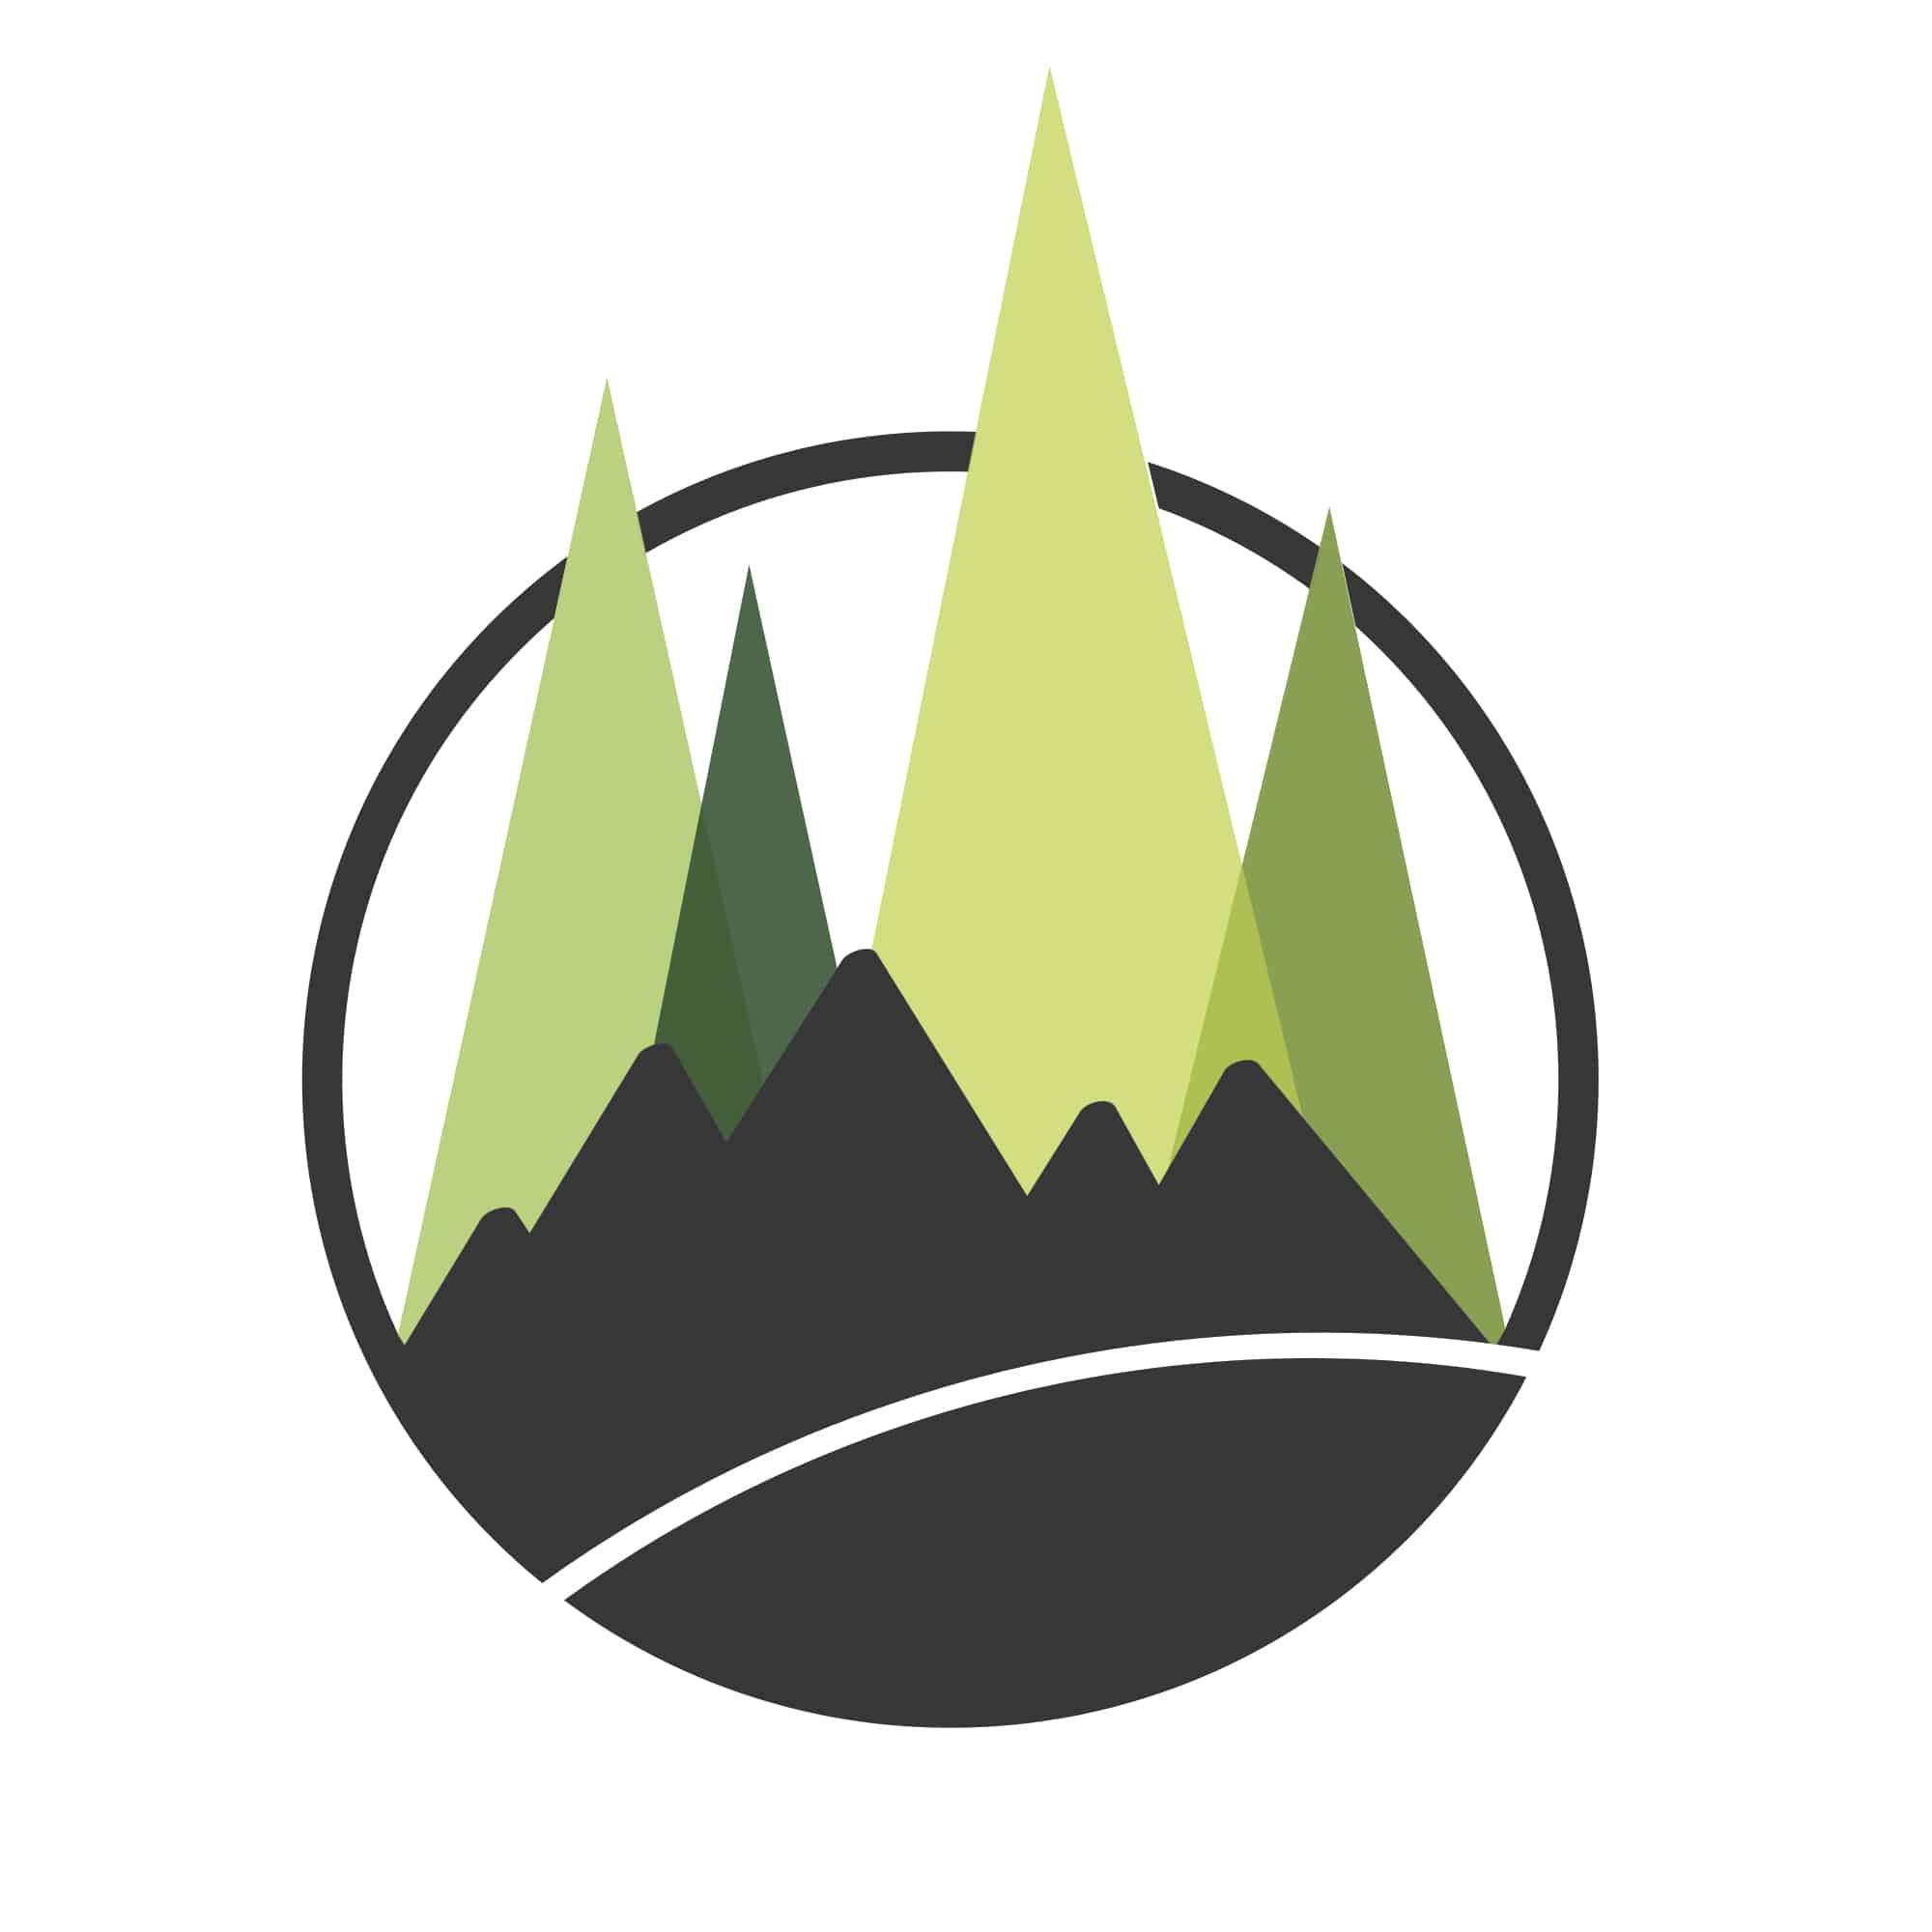 logo copy trail mix for newlyweds